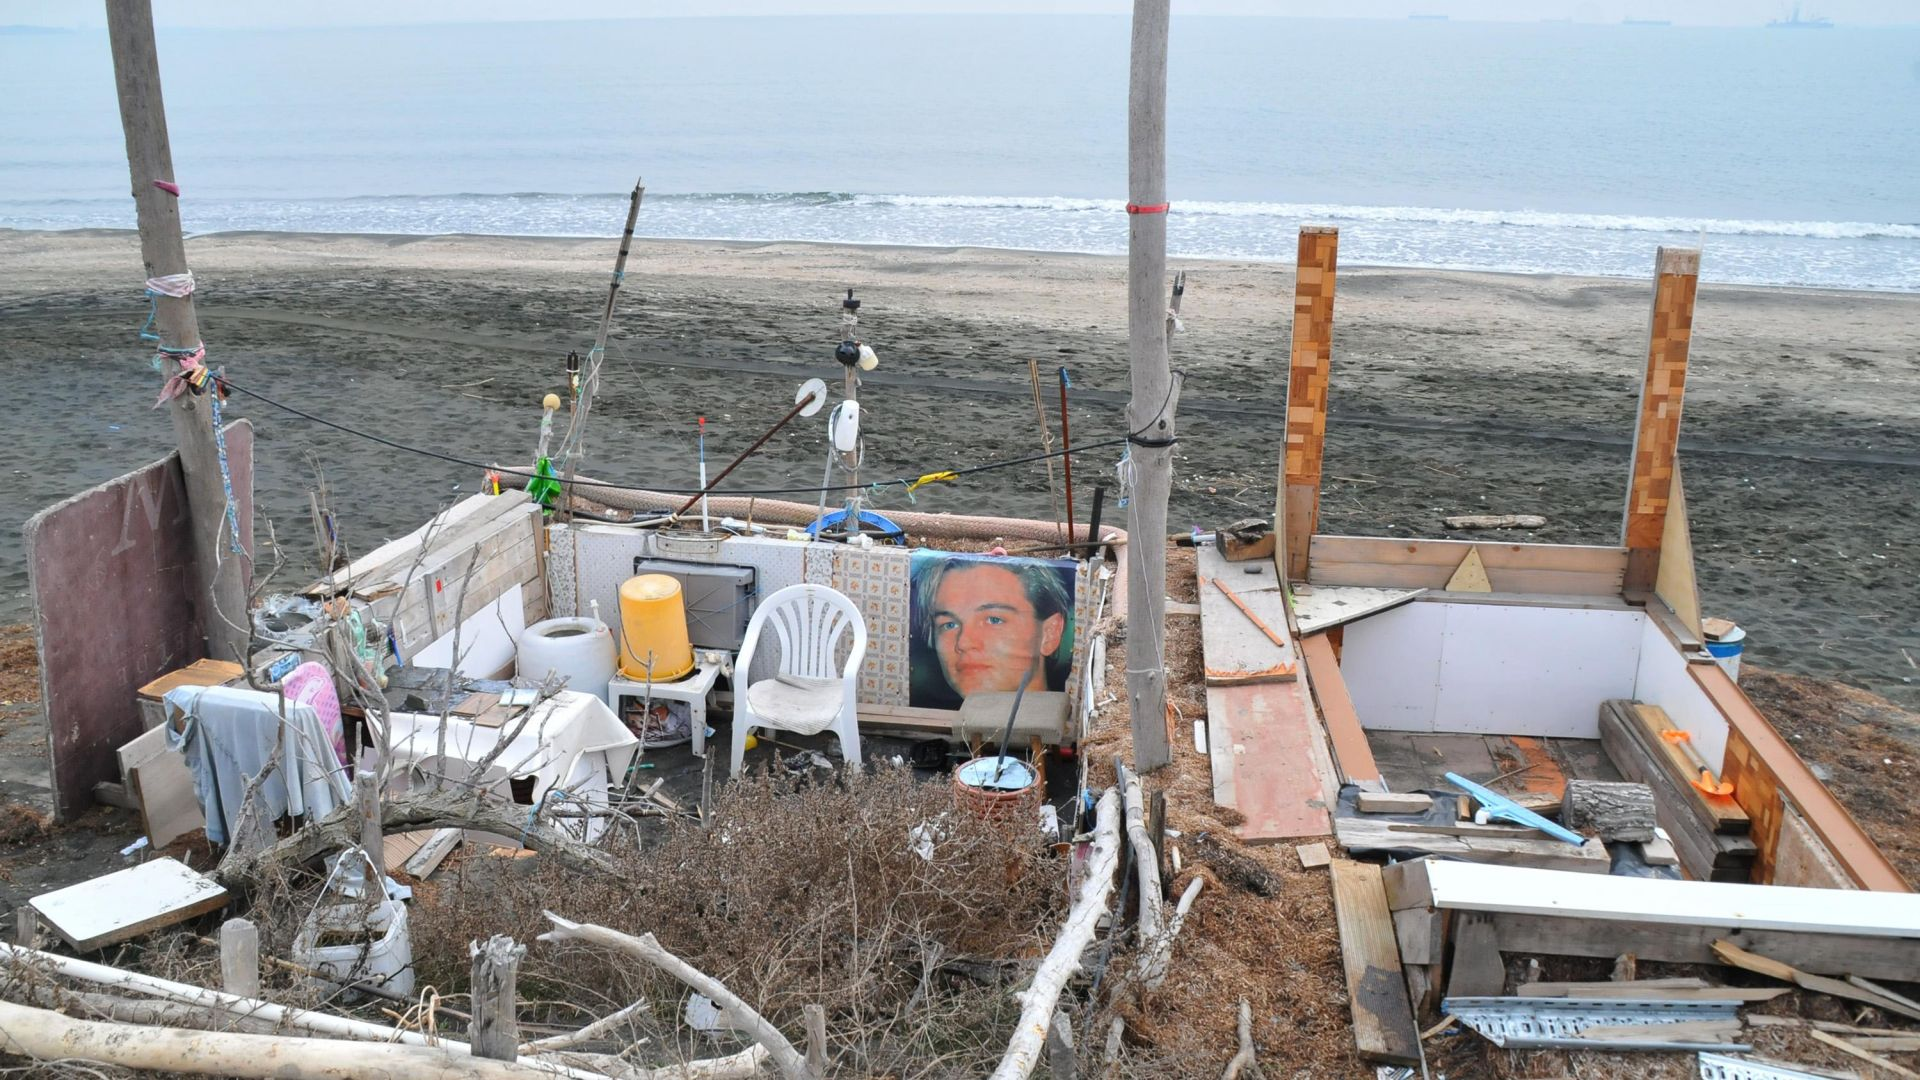 Снимка: Пенсионери си направиха бивак на плажа